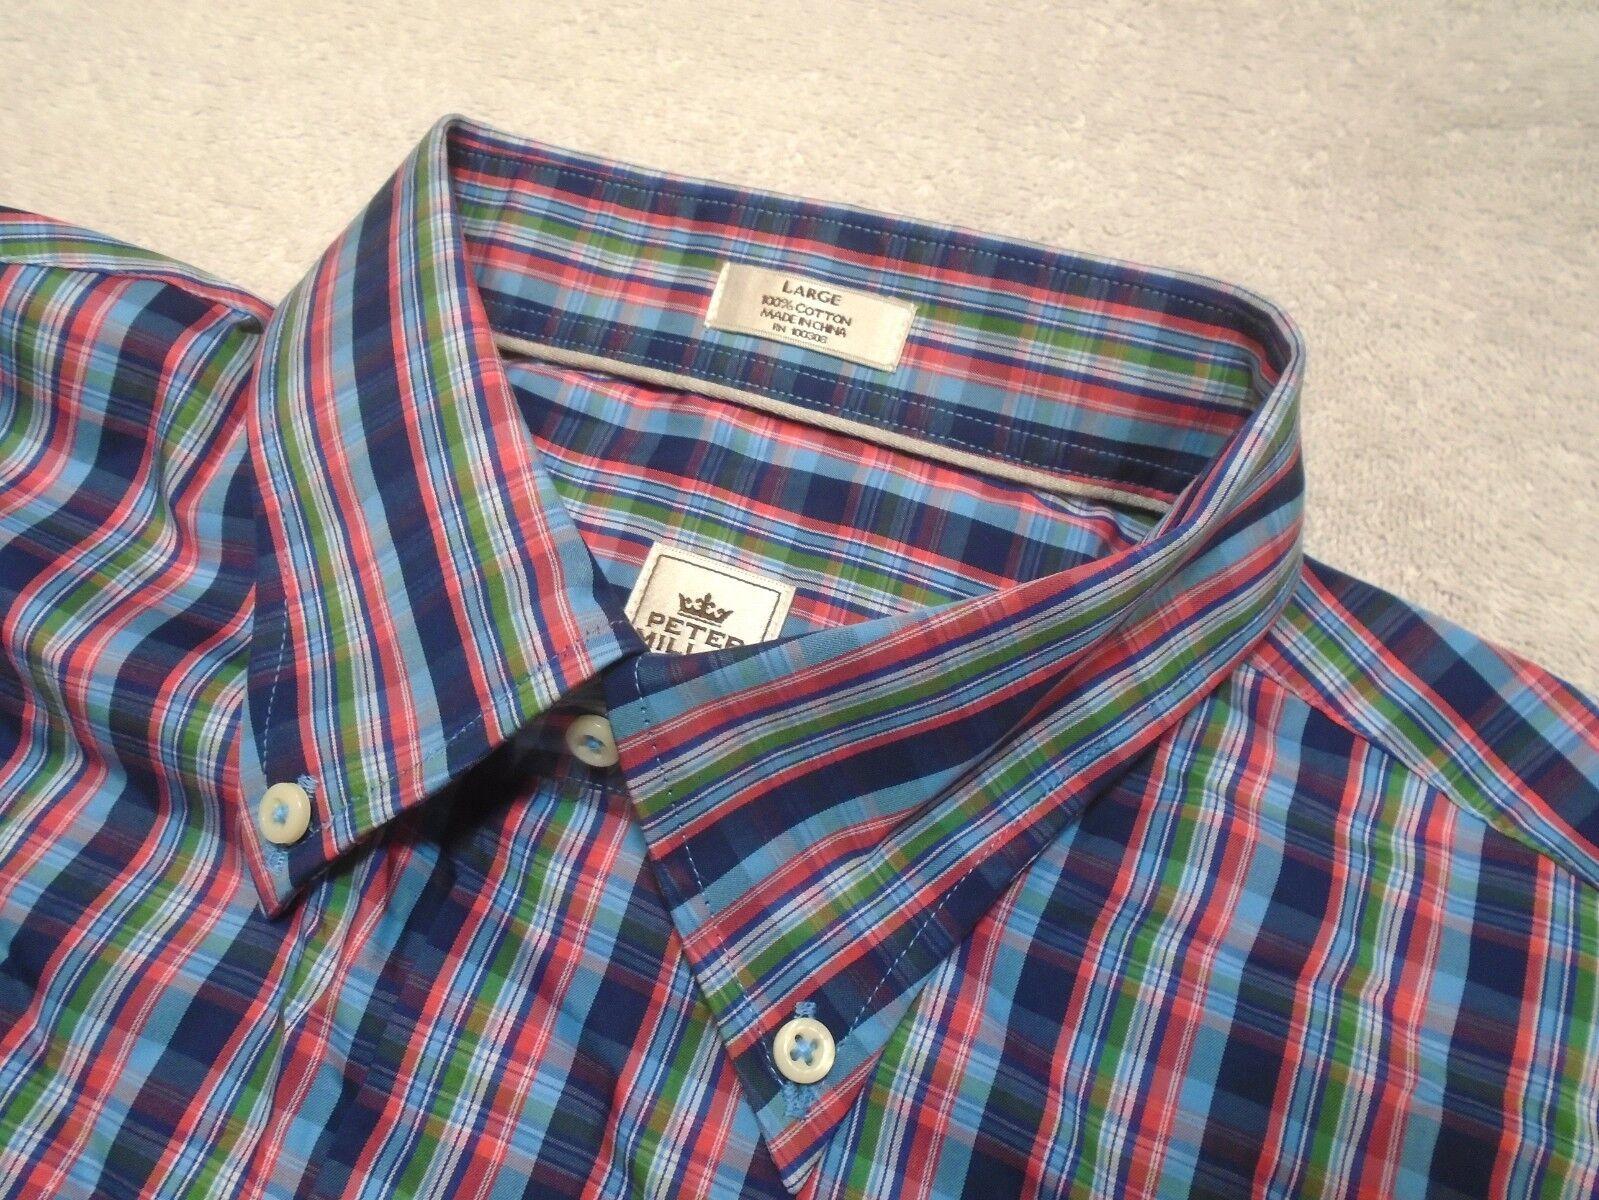 Peter Millar 100% Cotton Marineblau Mehrfarbig Kariert Sport Hemd Nwt Nwt Nwt | Online-Shop  55501d